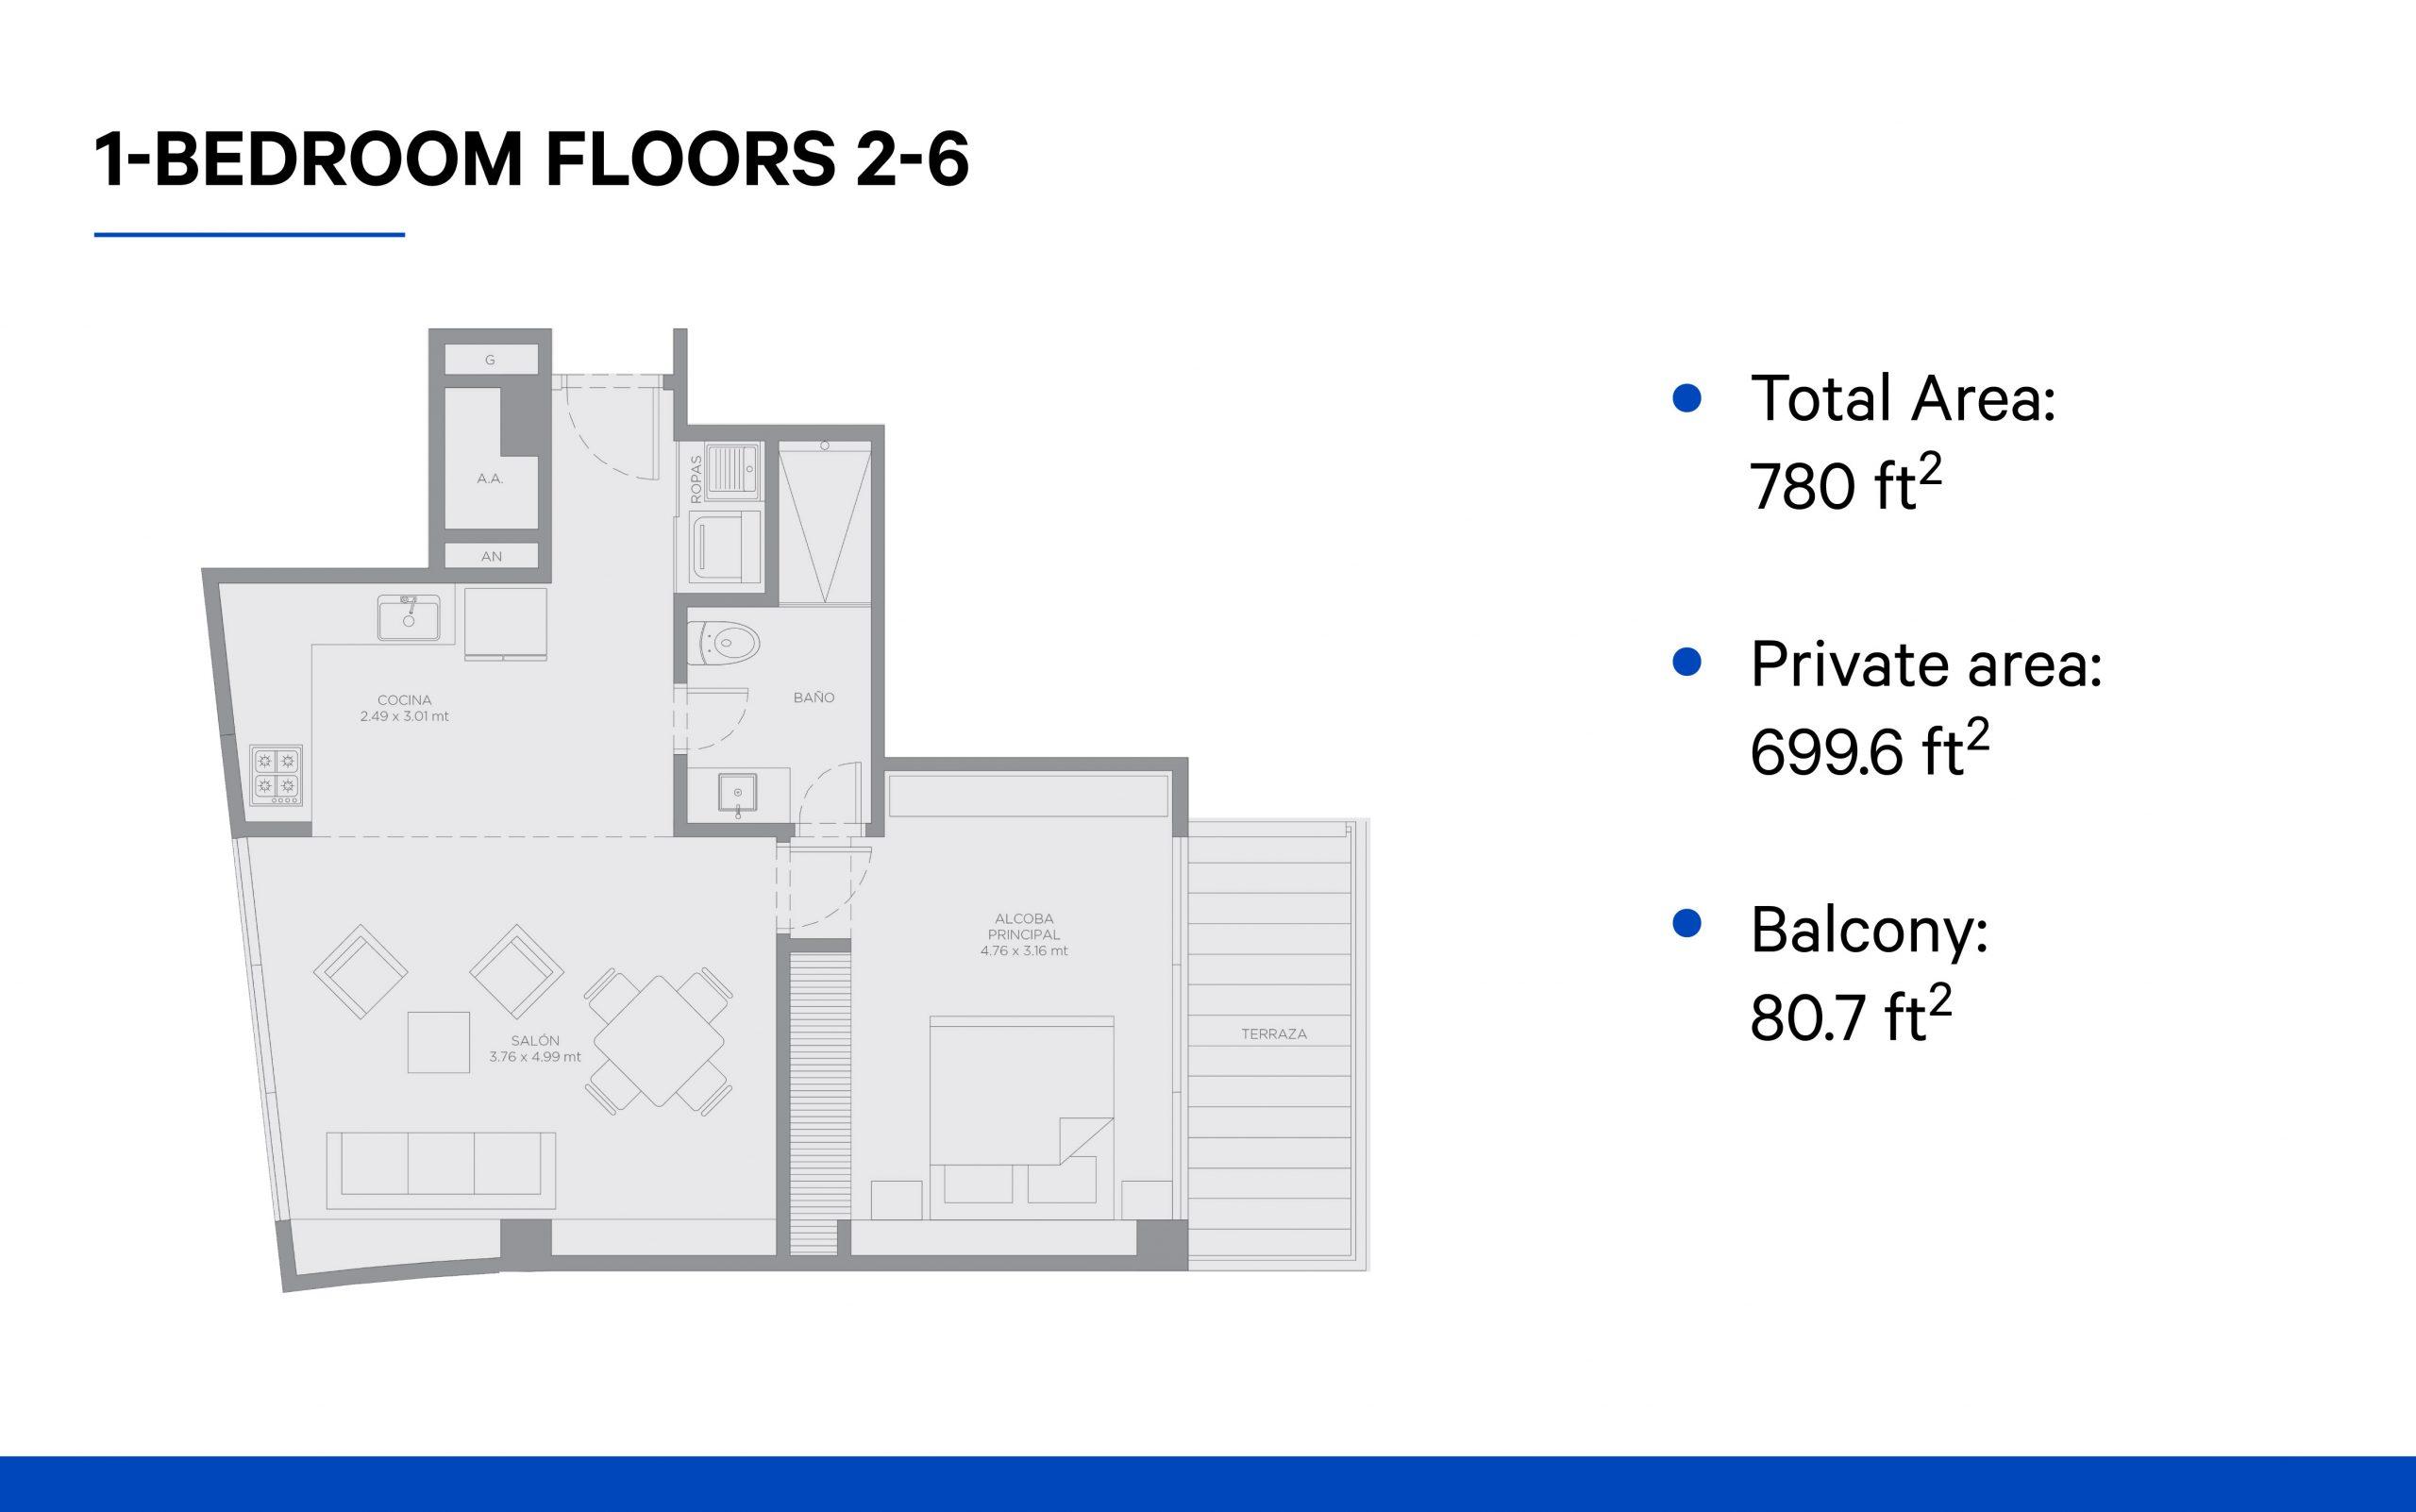 1-bedroom (2-6 floors)